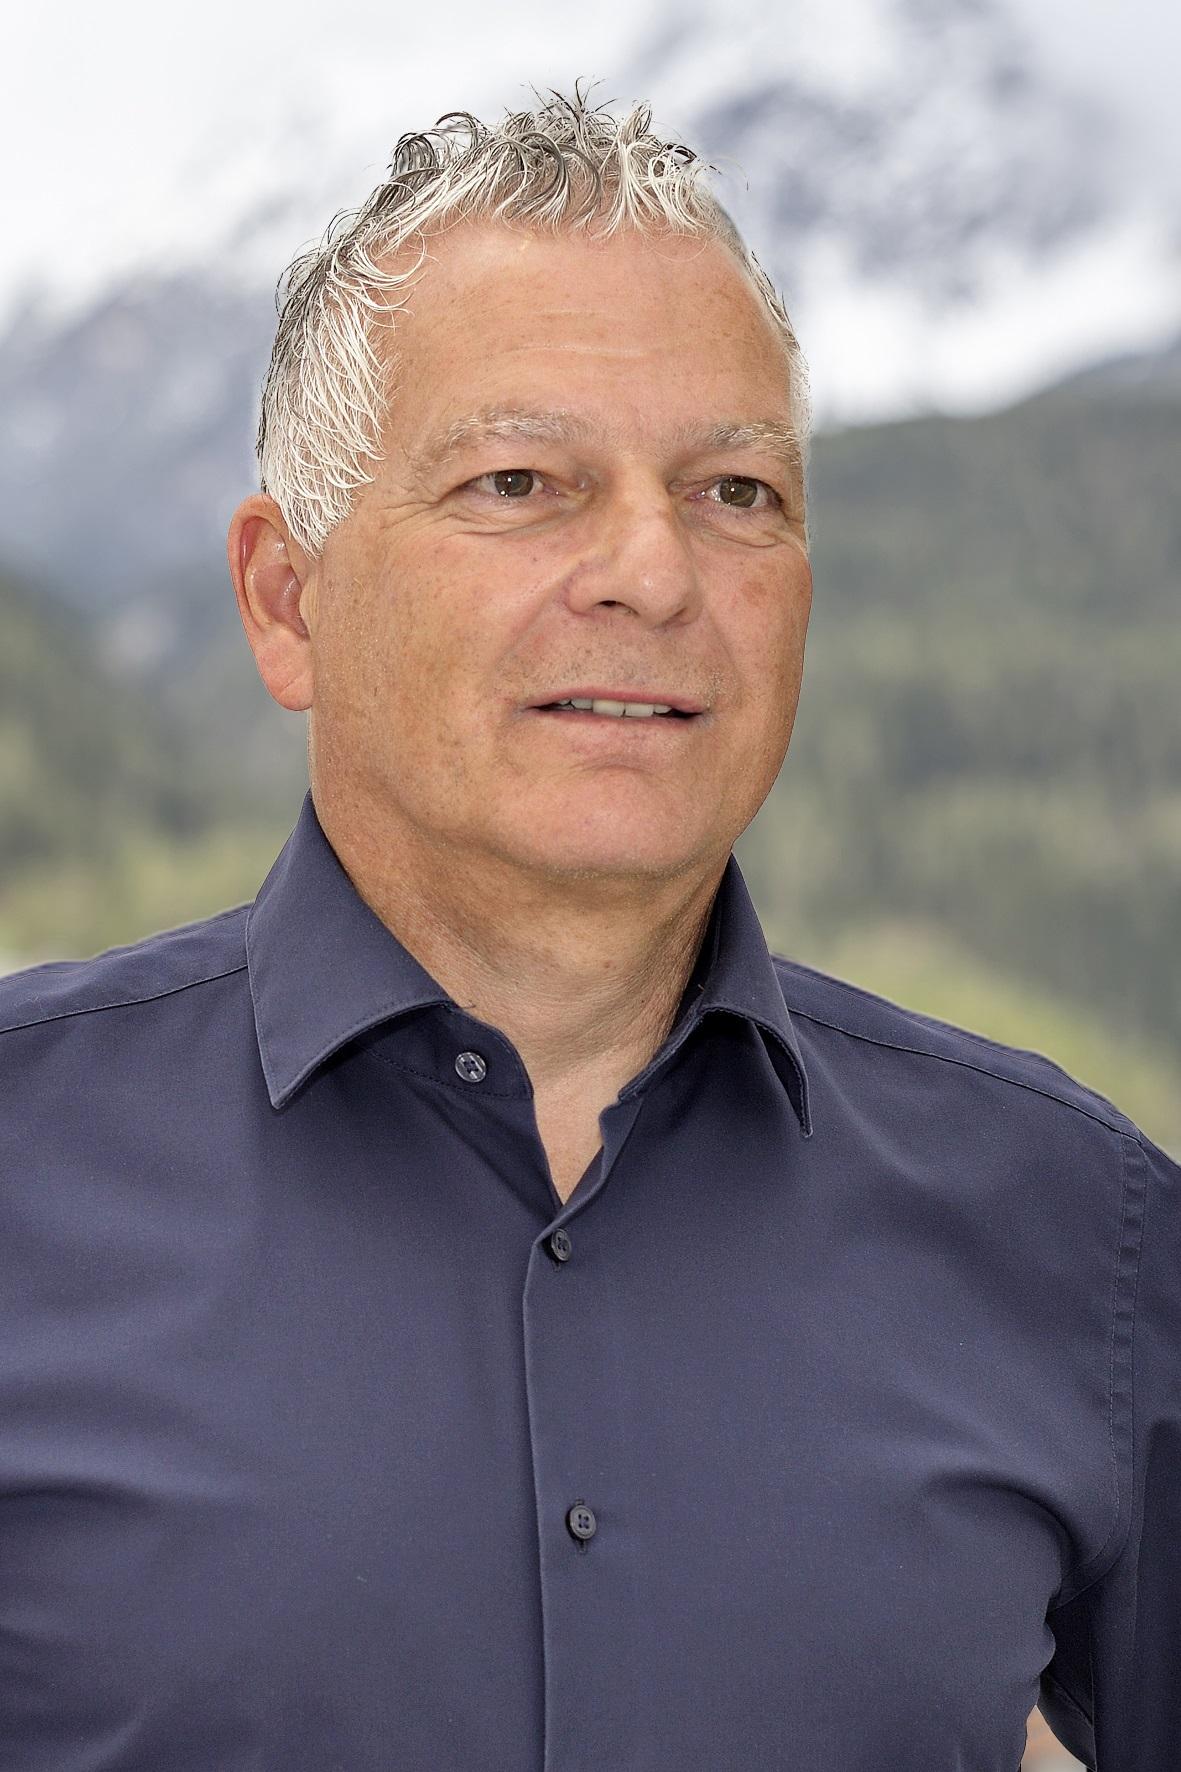 Daniel Blumenthal